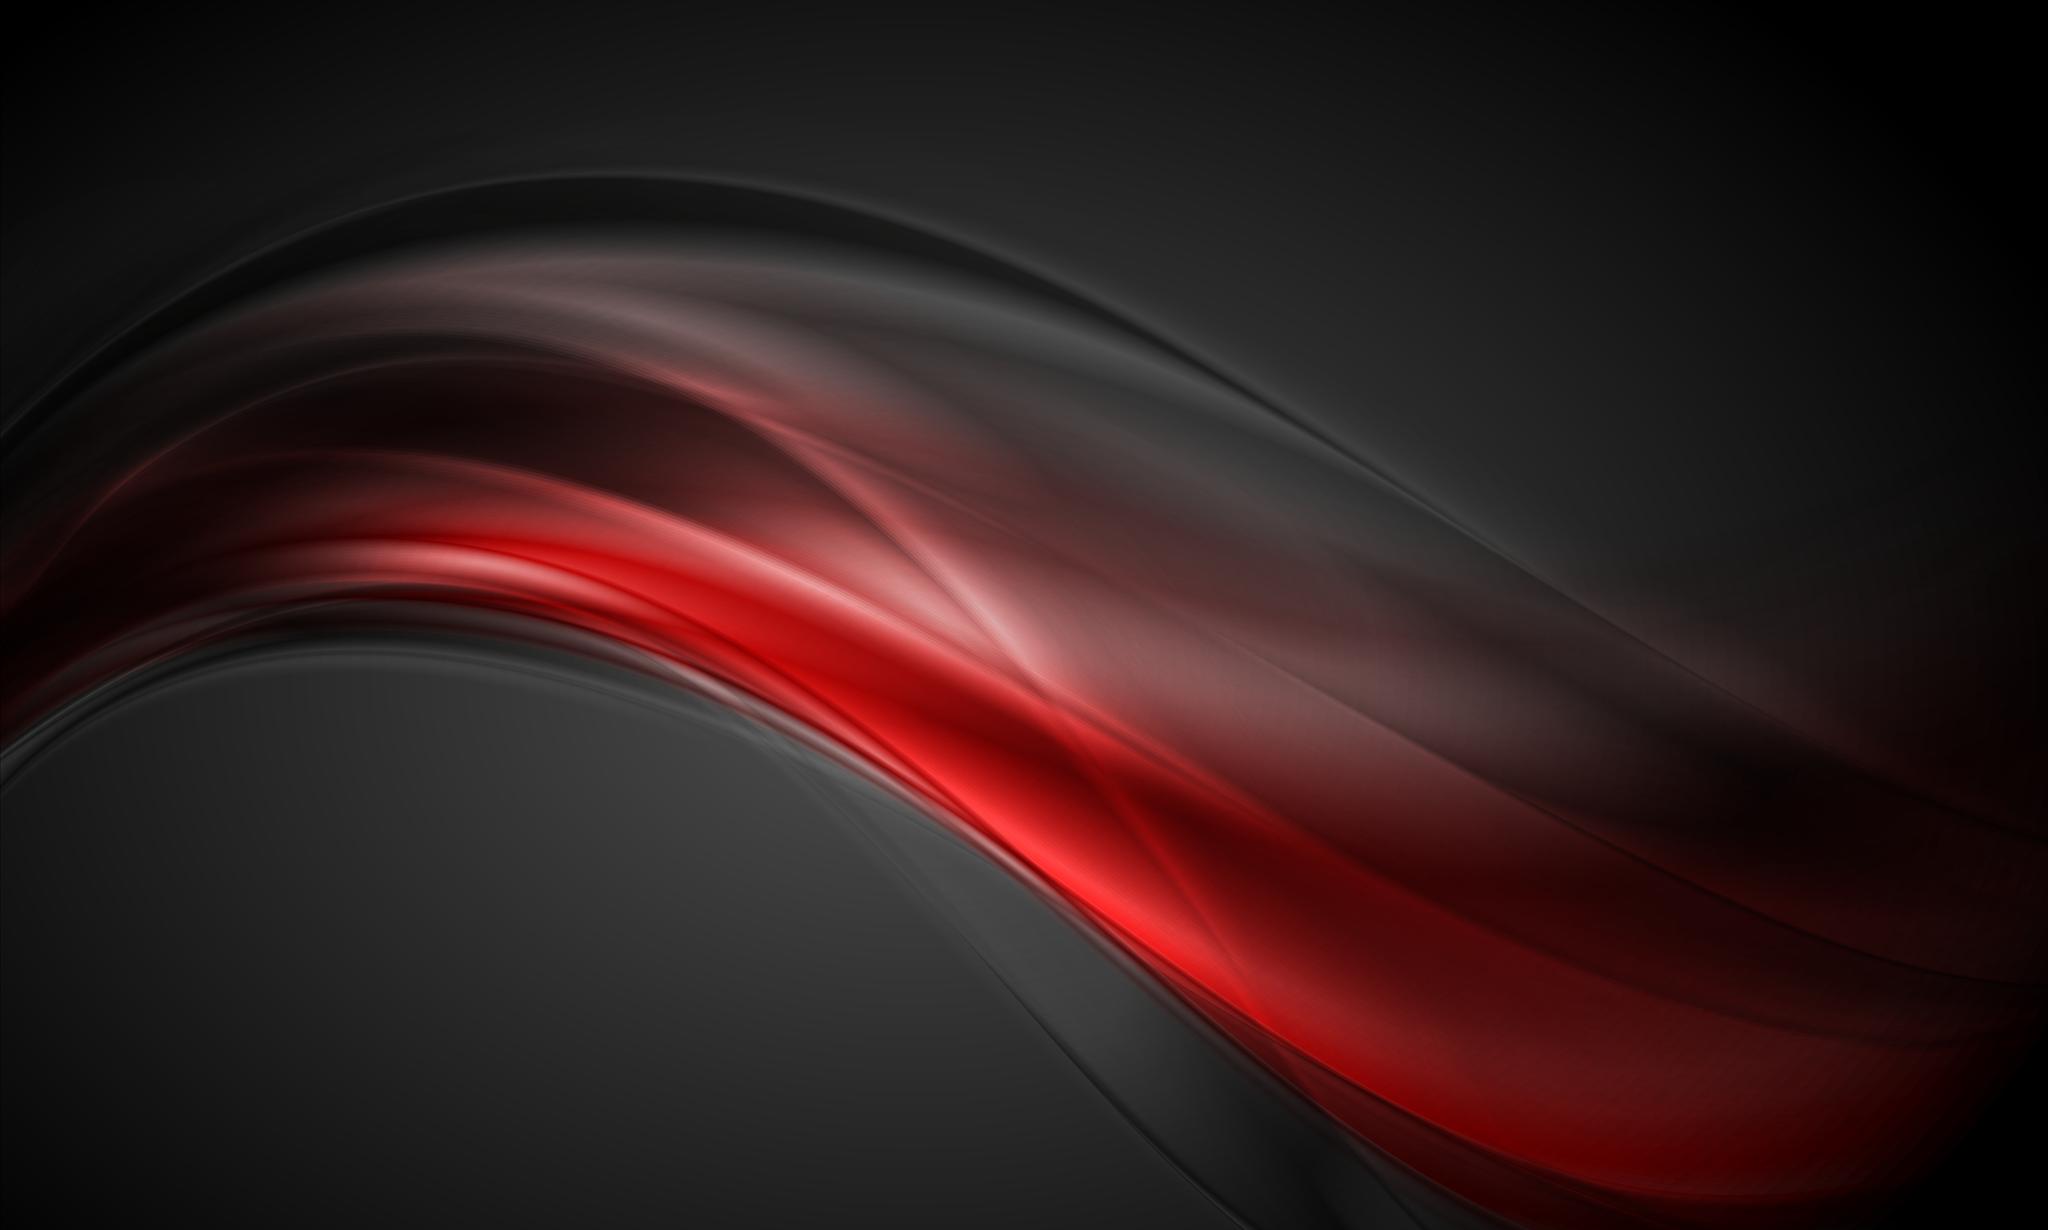 AdobeStock_70547714 [Konvertiert]-01-983791-edited.png